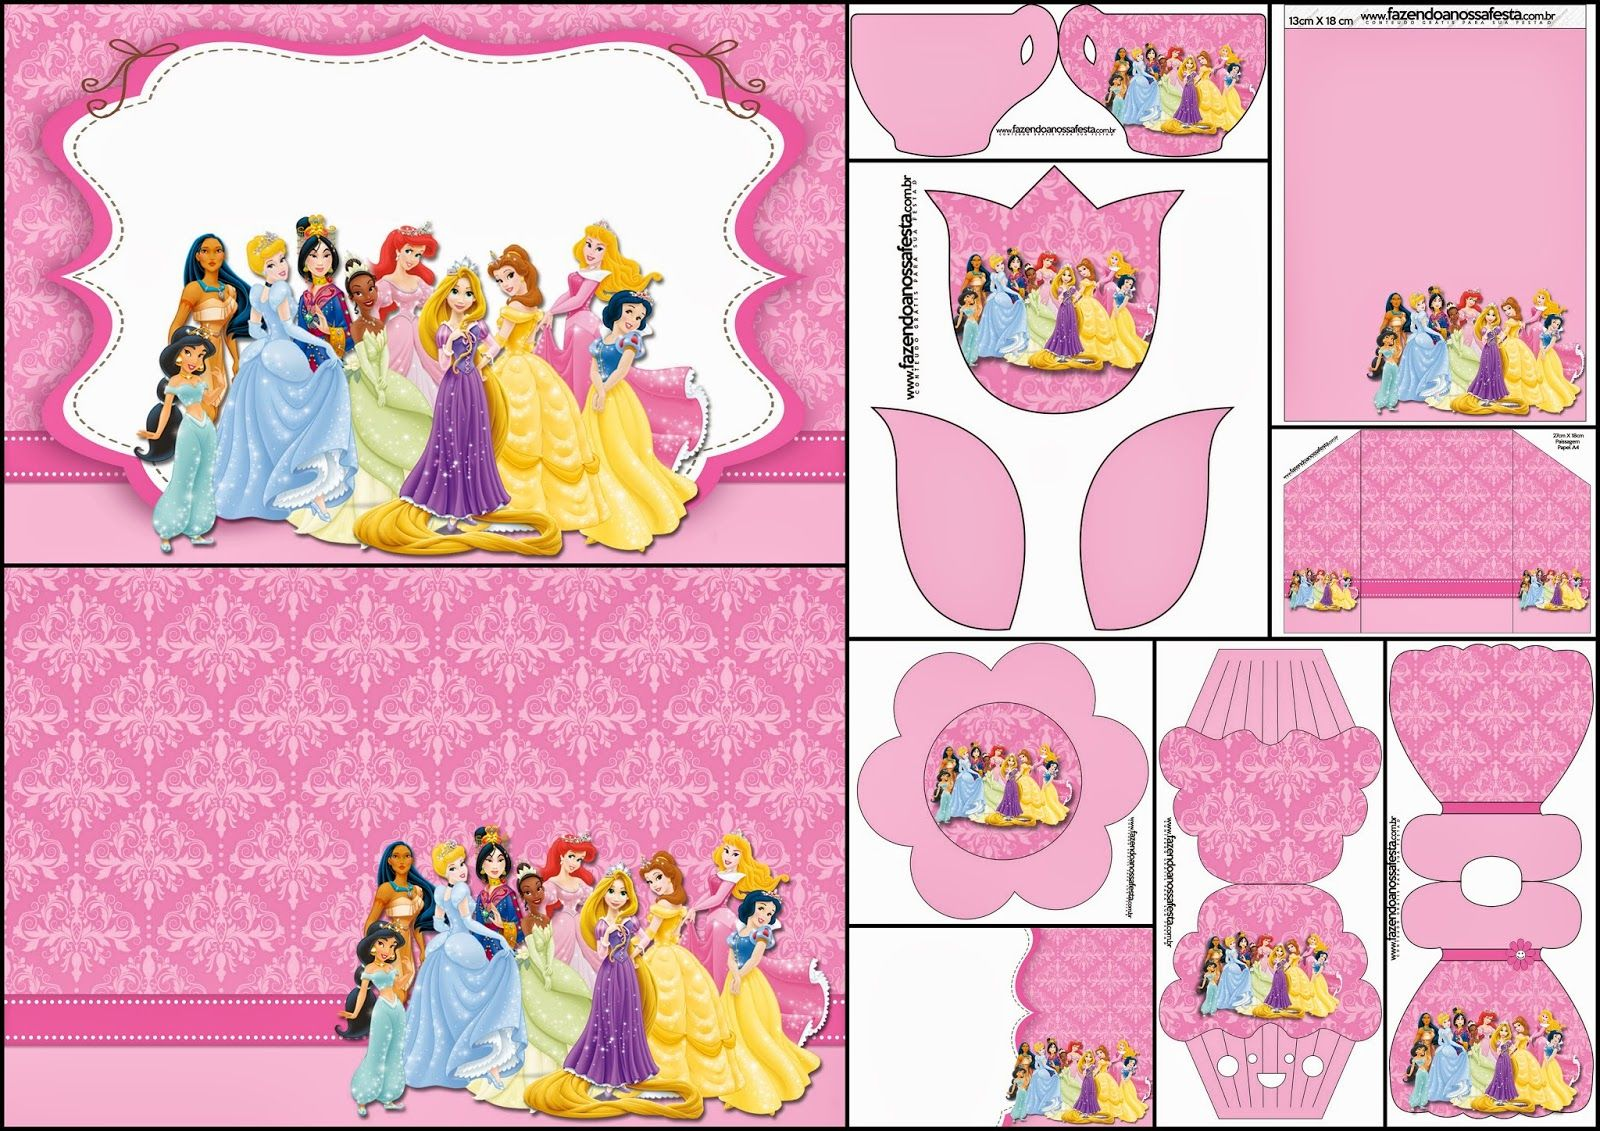 Disney Princess Pary: Free Printable Party Invitations. | Disney ...